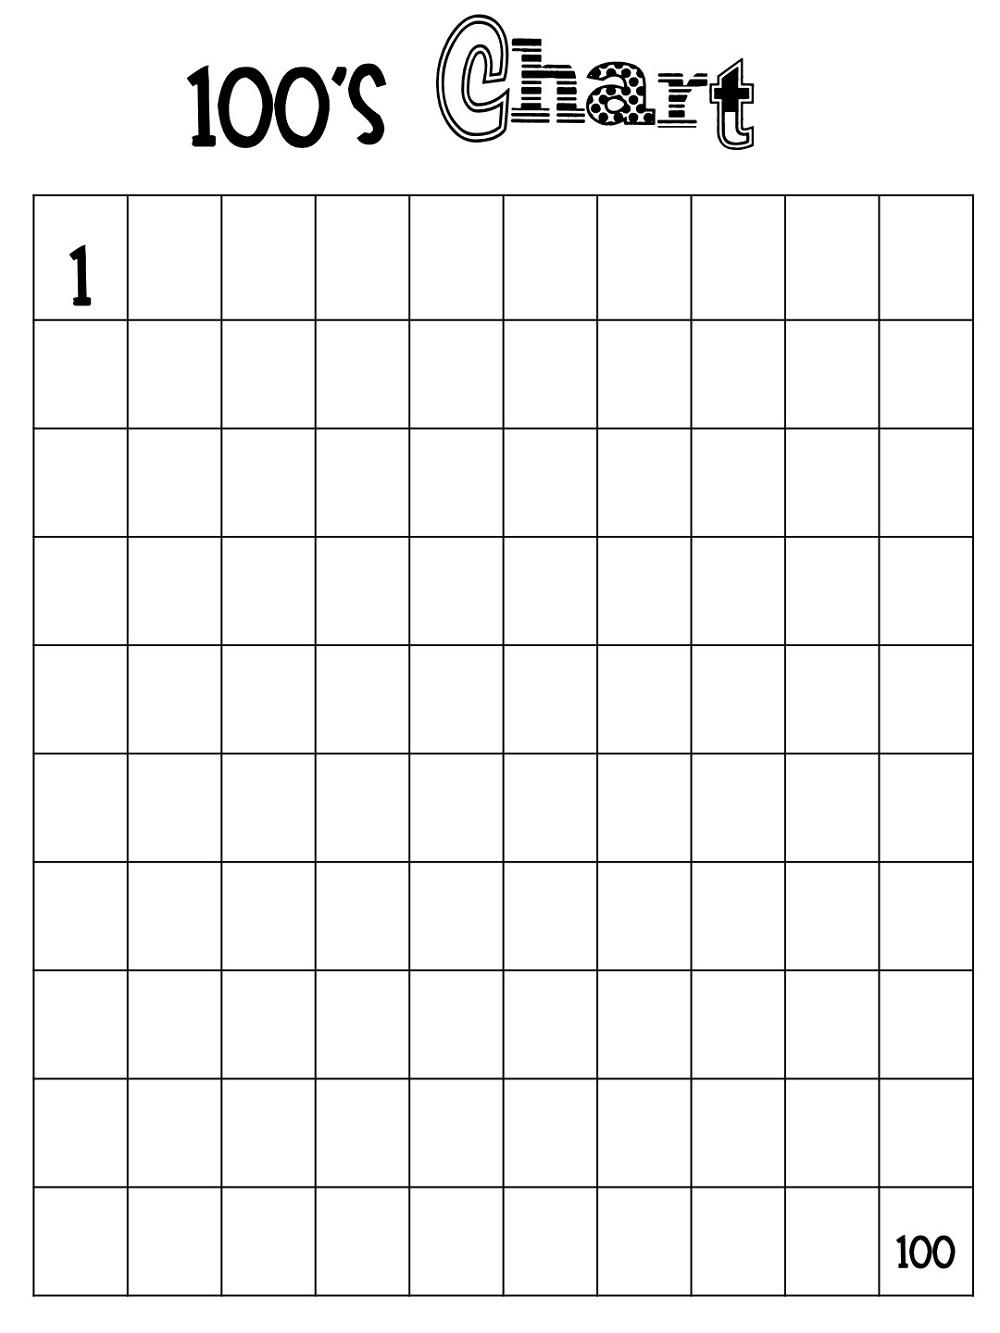 Blank Number Chart 1-100 Worksheets | Kiddo Shelter | Free Printable Blank 100 Chart Worksheets